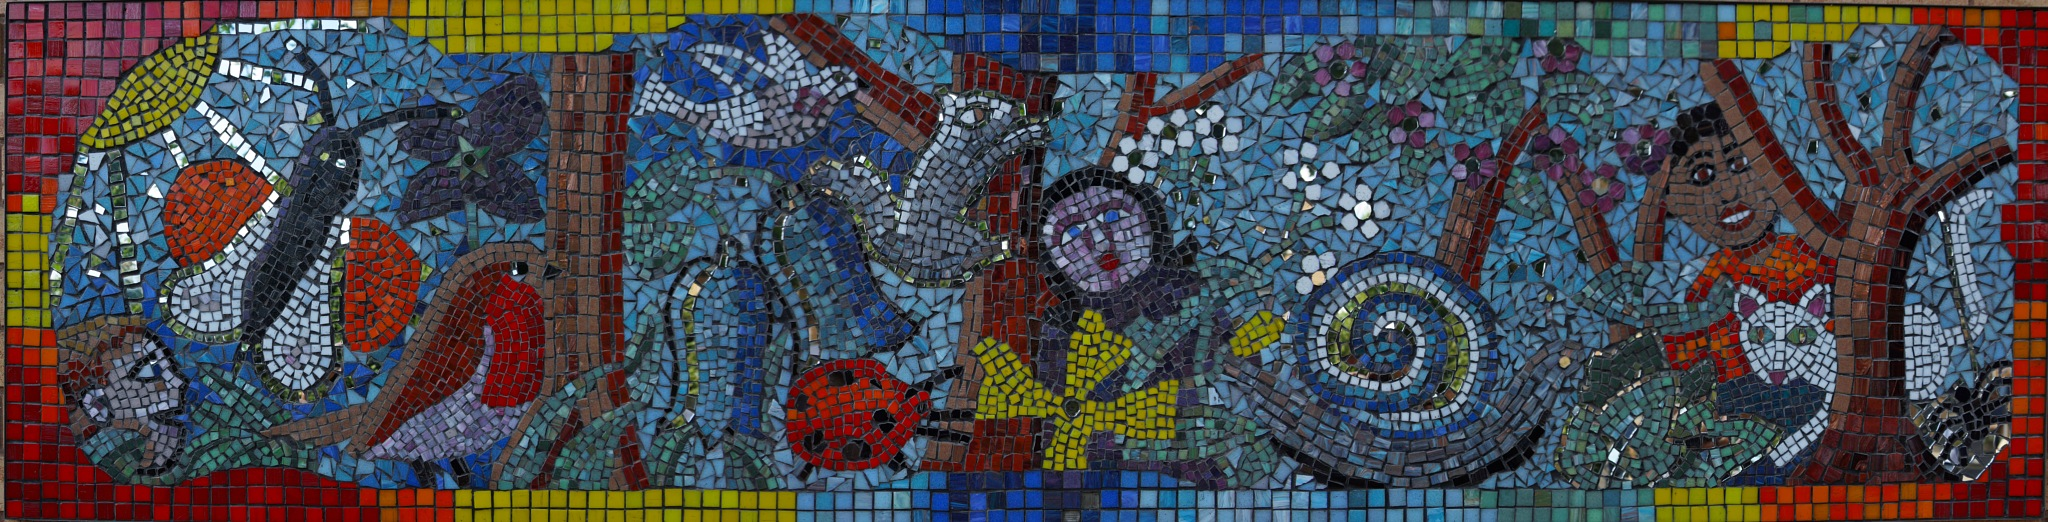 Wall Mosaic by steve_whitmarsh